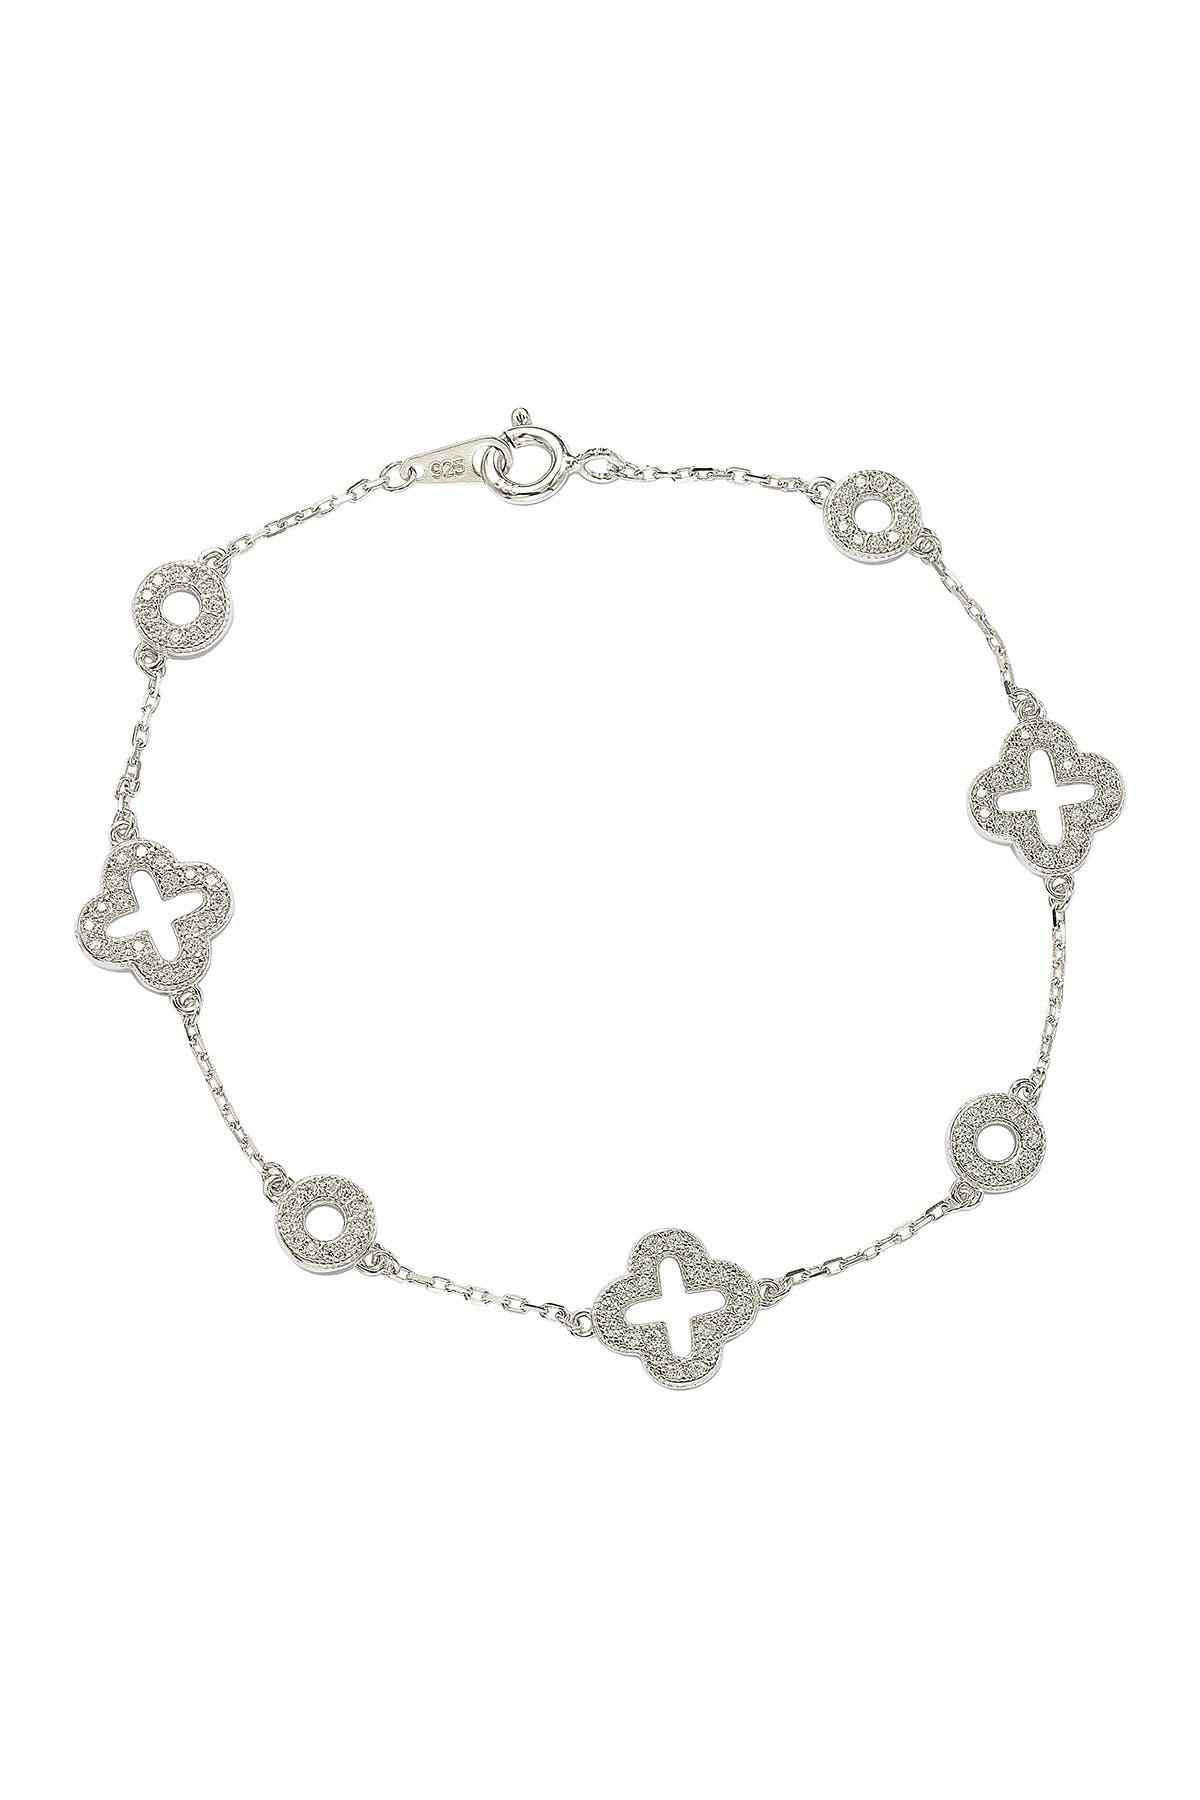 Image of Suzy Levian Sterling Silver CZ Clover Tennis Bracelet